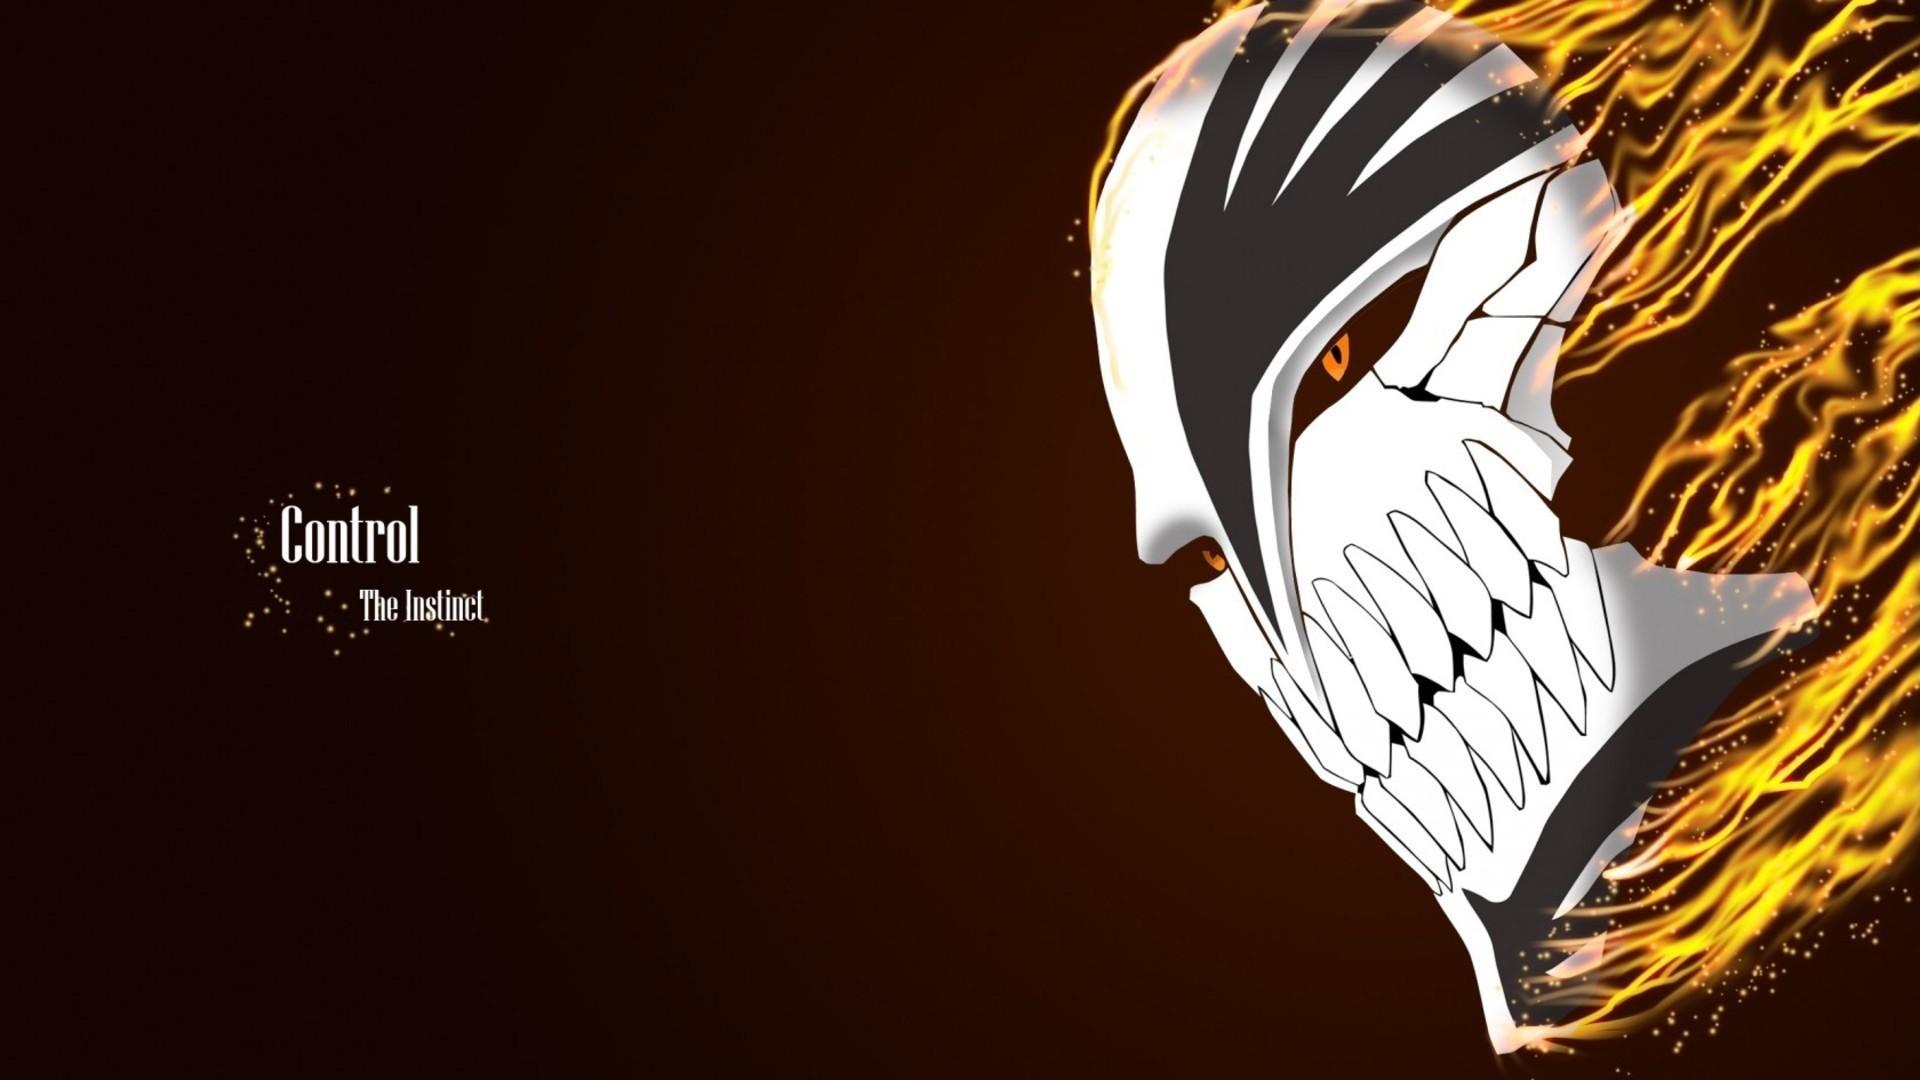 hollow mask ichigo kurosaki bleach anime hd wallpaper full resolution .